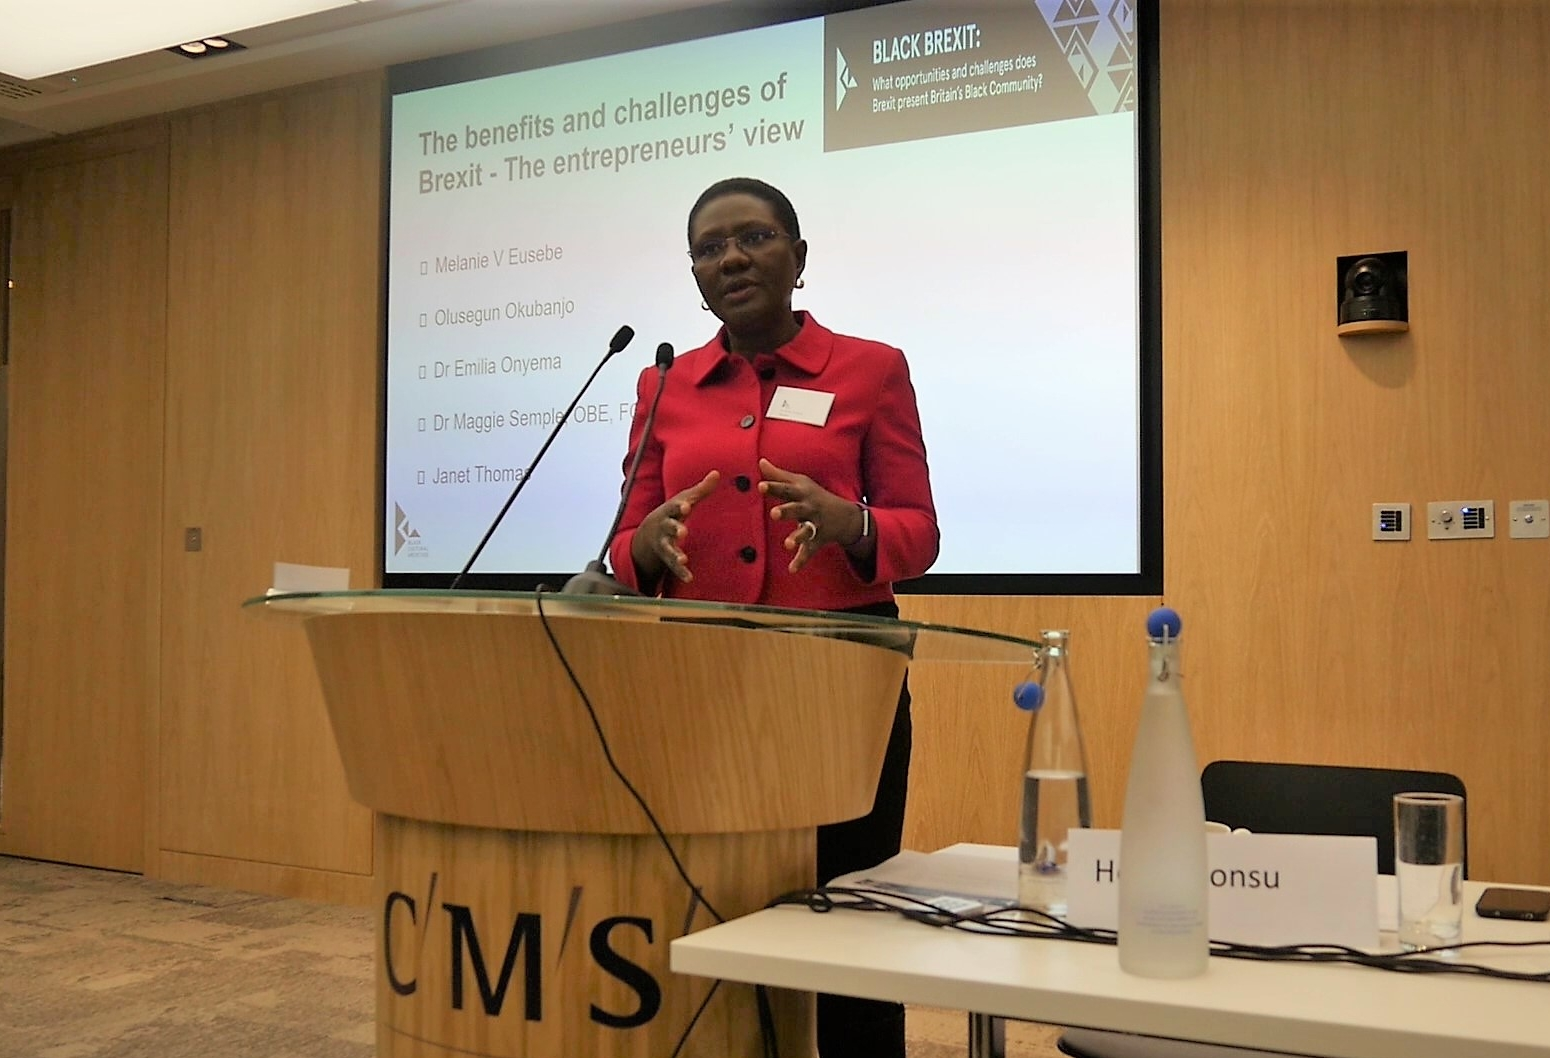 Dr. Emilia Onyema